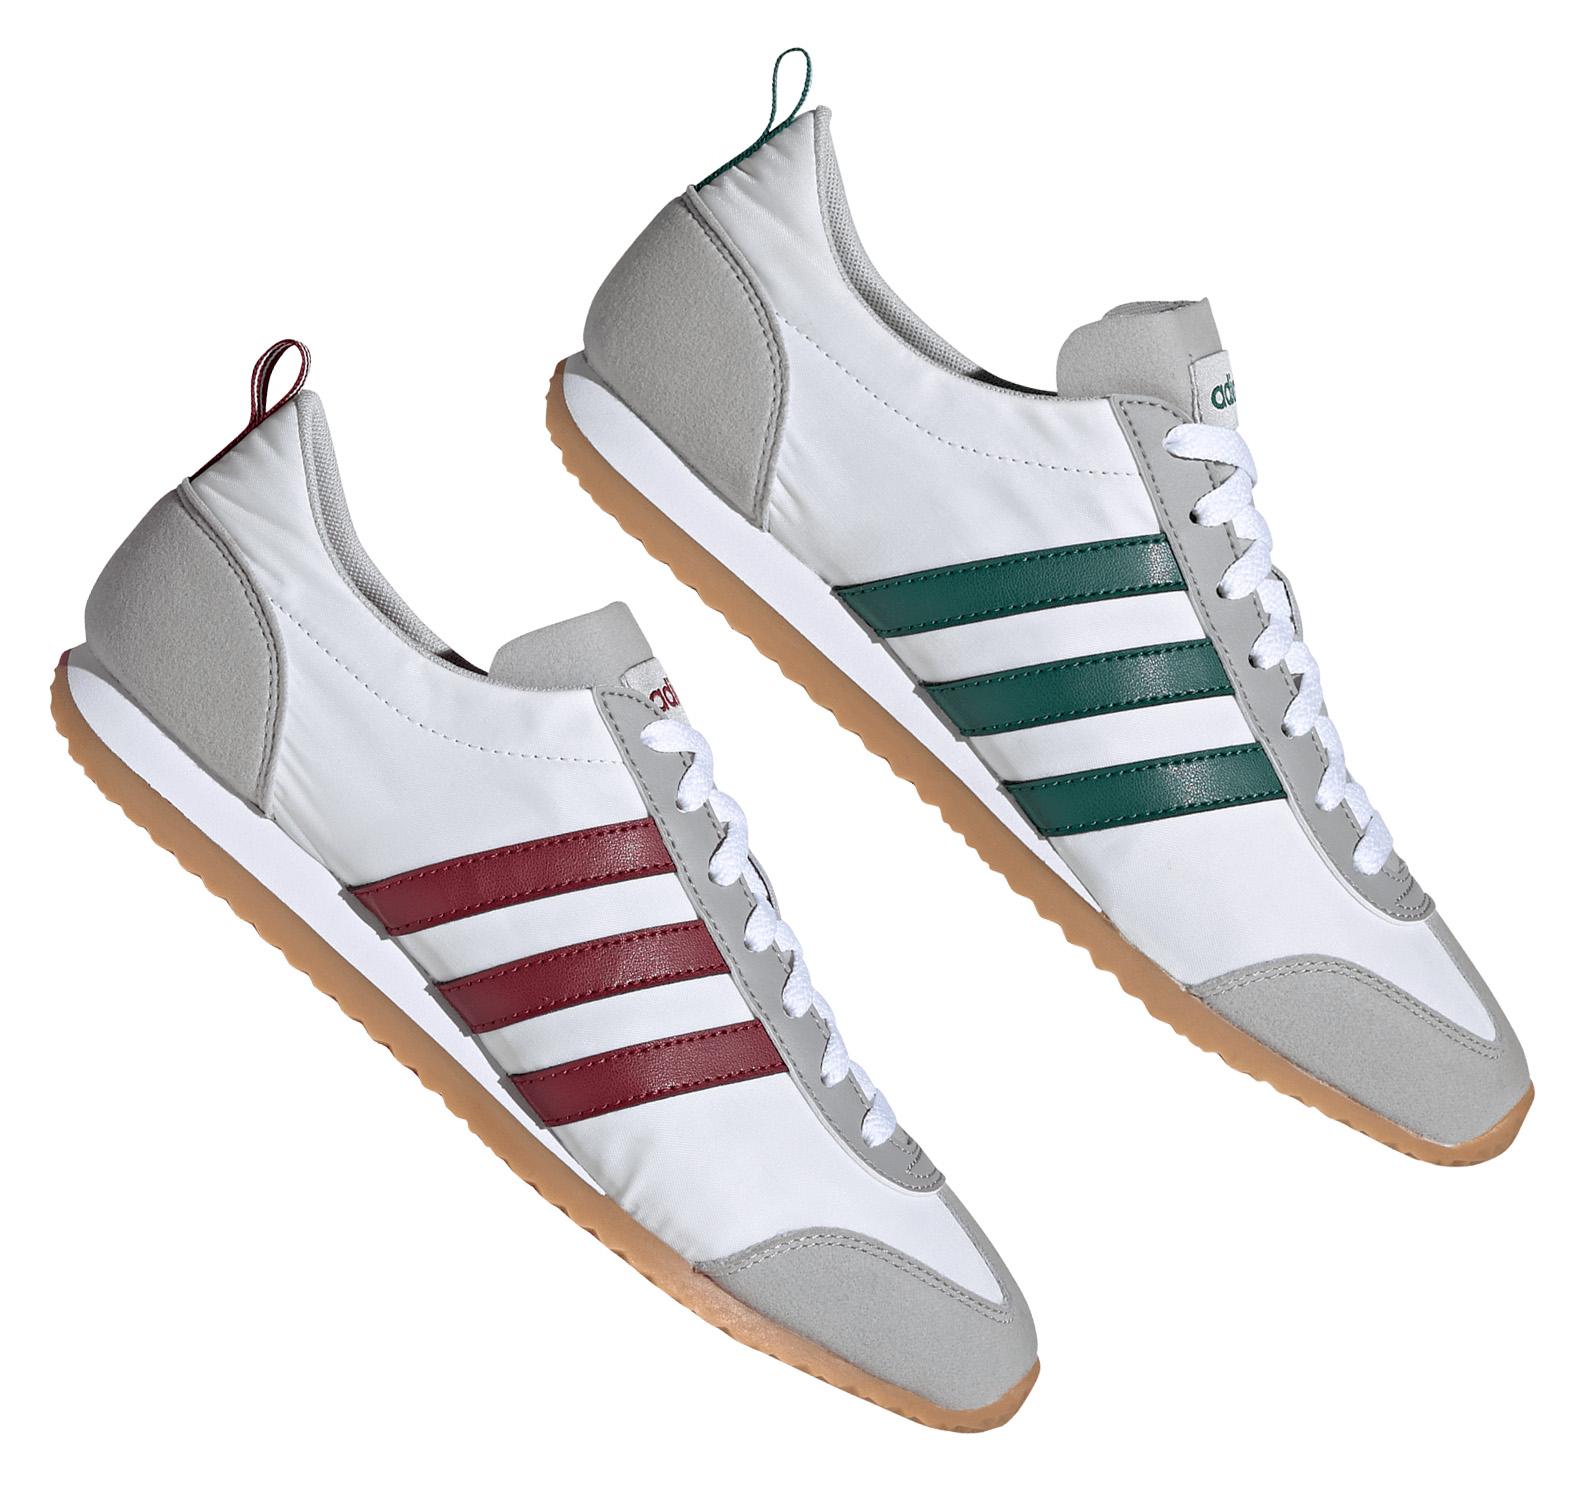 adidas Sneakers VS Jogger (Größen 41 1/3 bis 47 1/3)